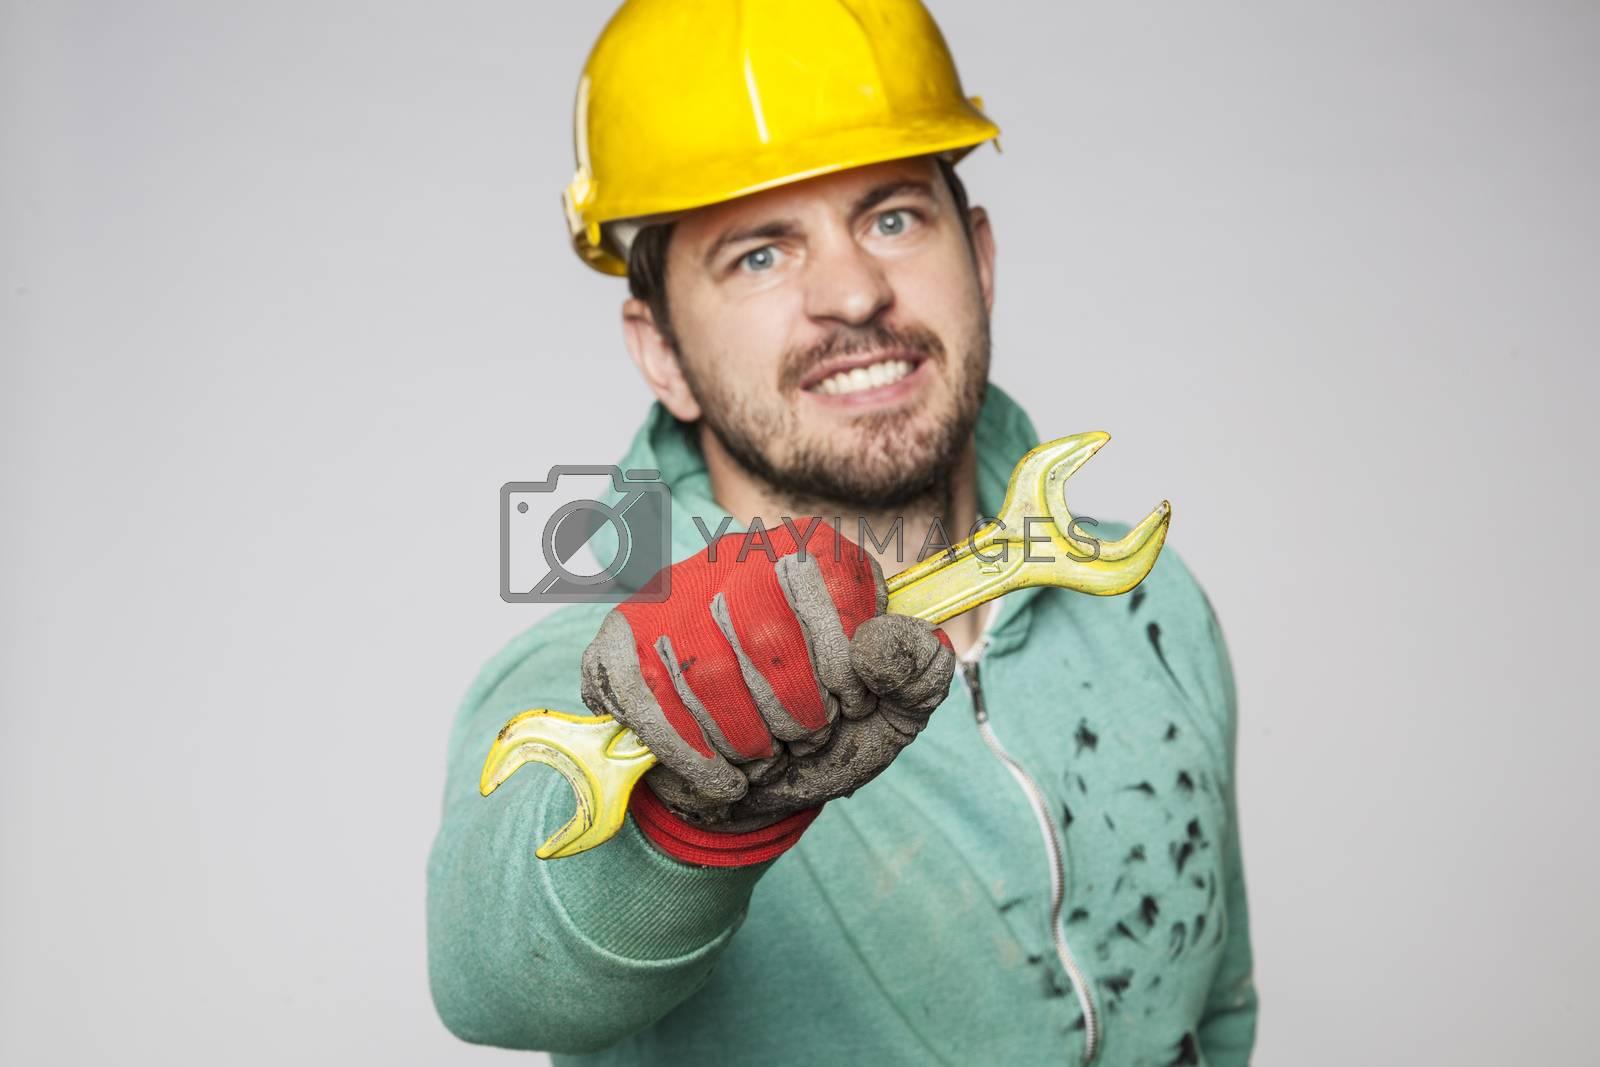 Handyman worker, ready to help